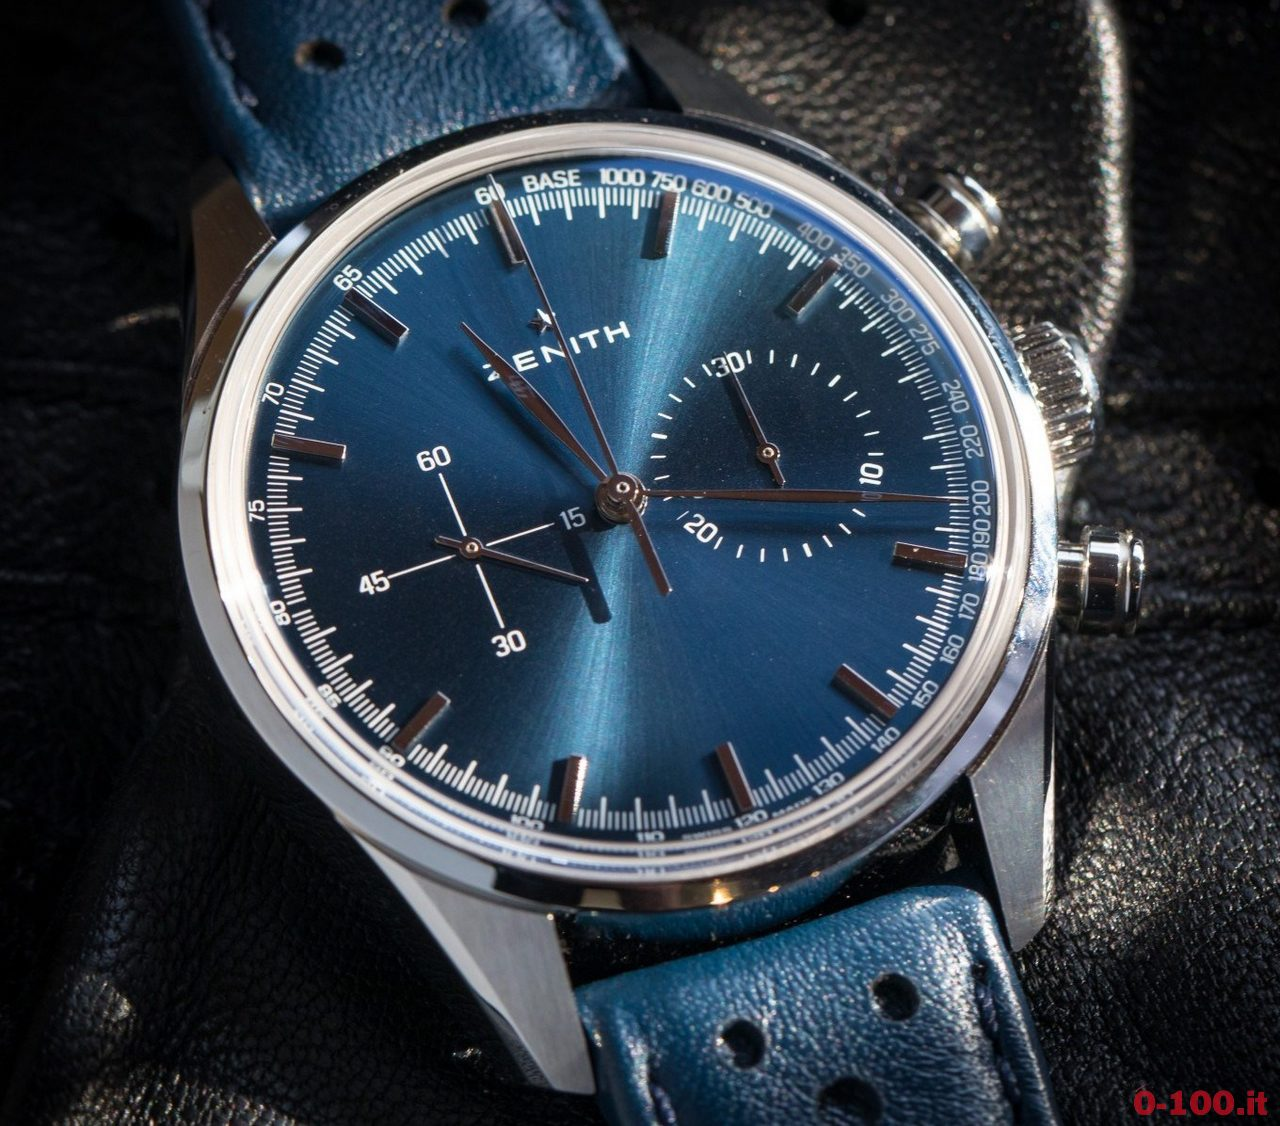 anteprima-baselworld-2017-zenith-heritage-146-chronograph-prezzo-price_0-1001